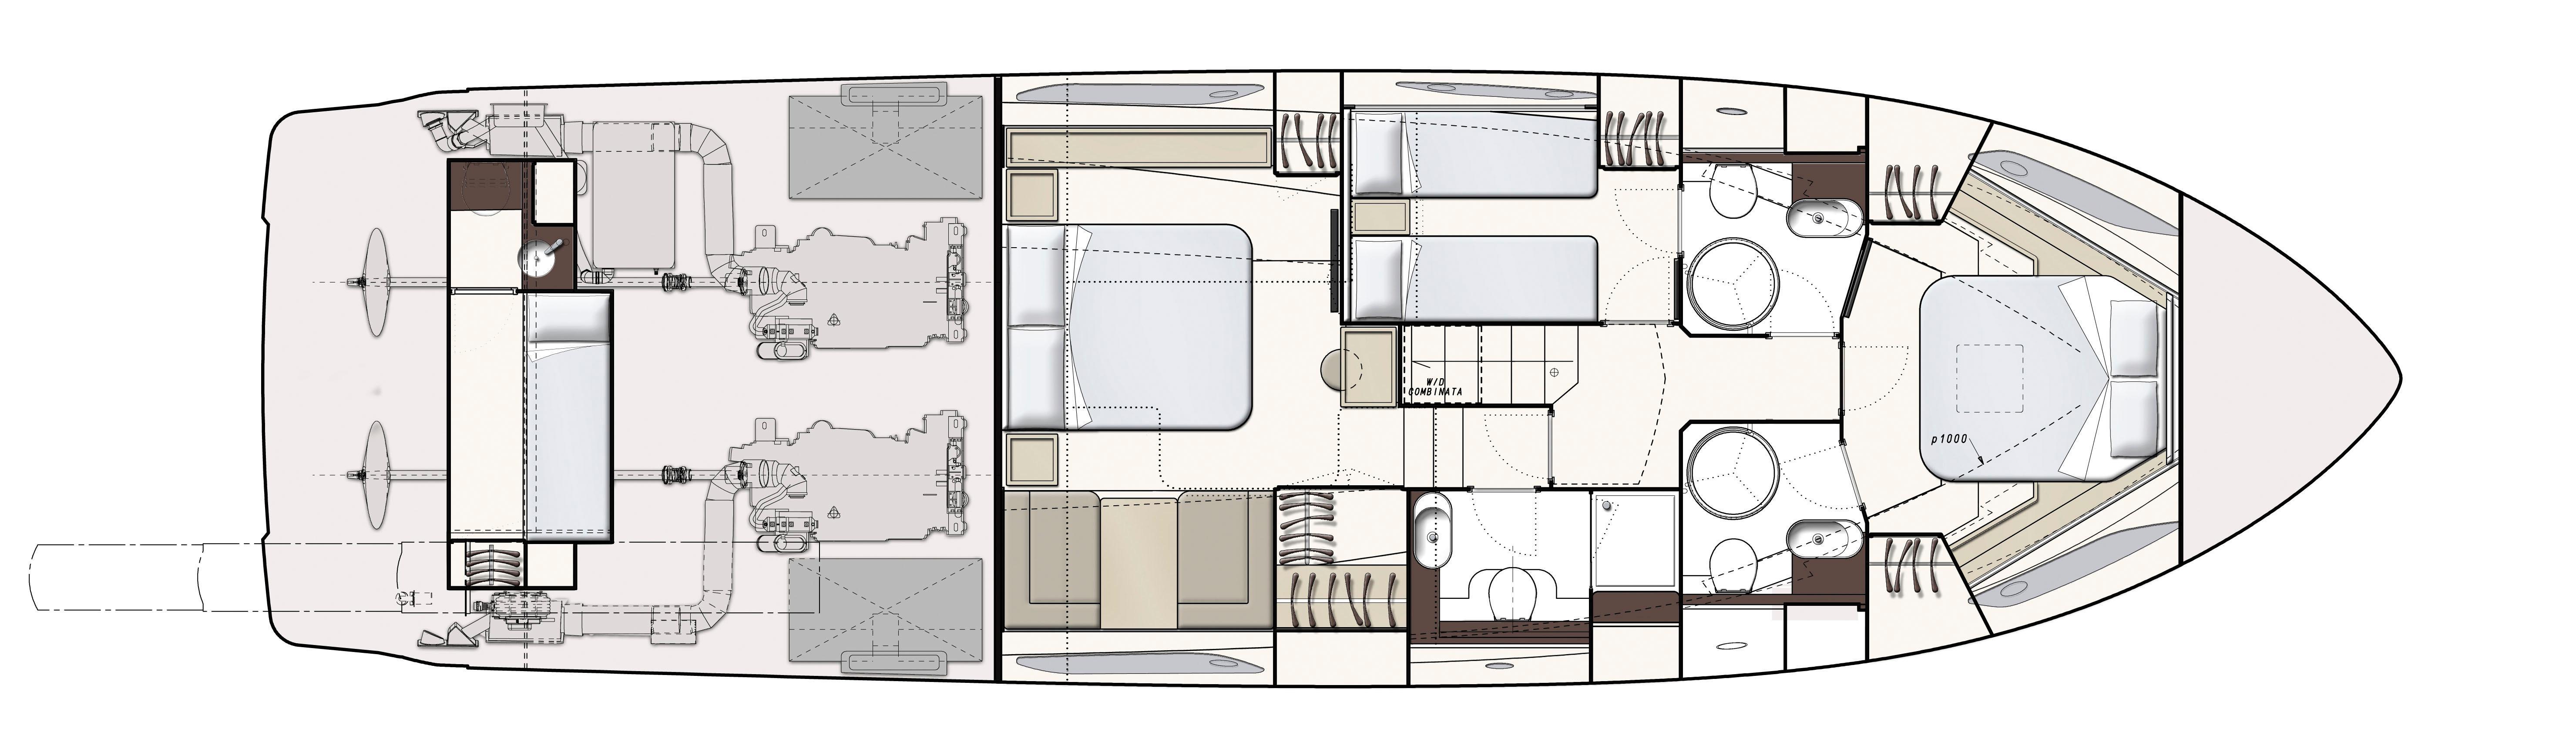 Ferretti 550 Optional Lower Deck Layout Plan